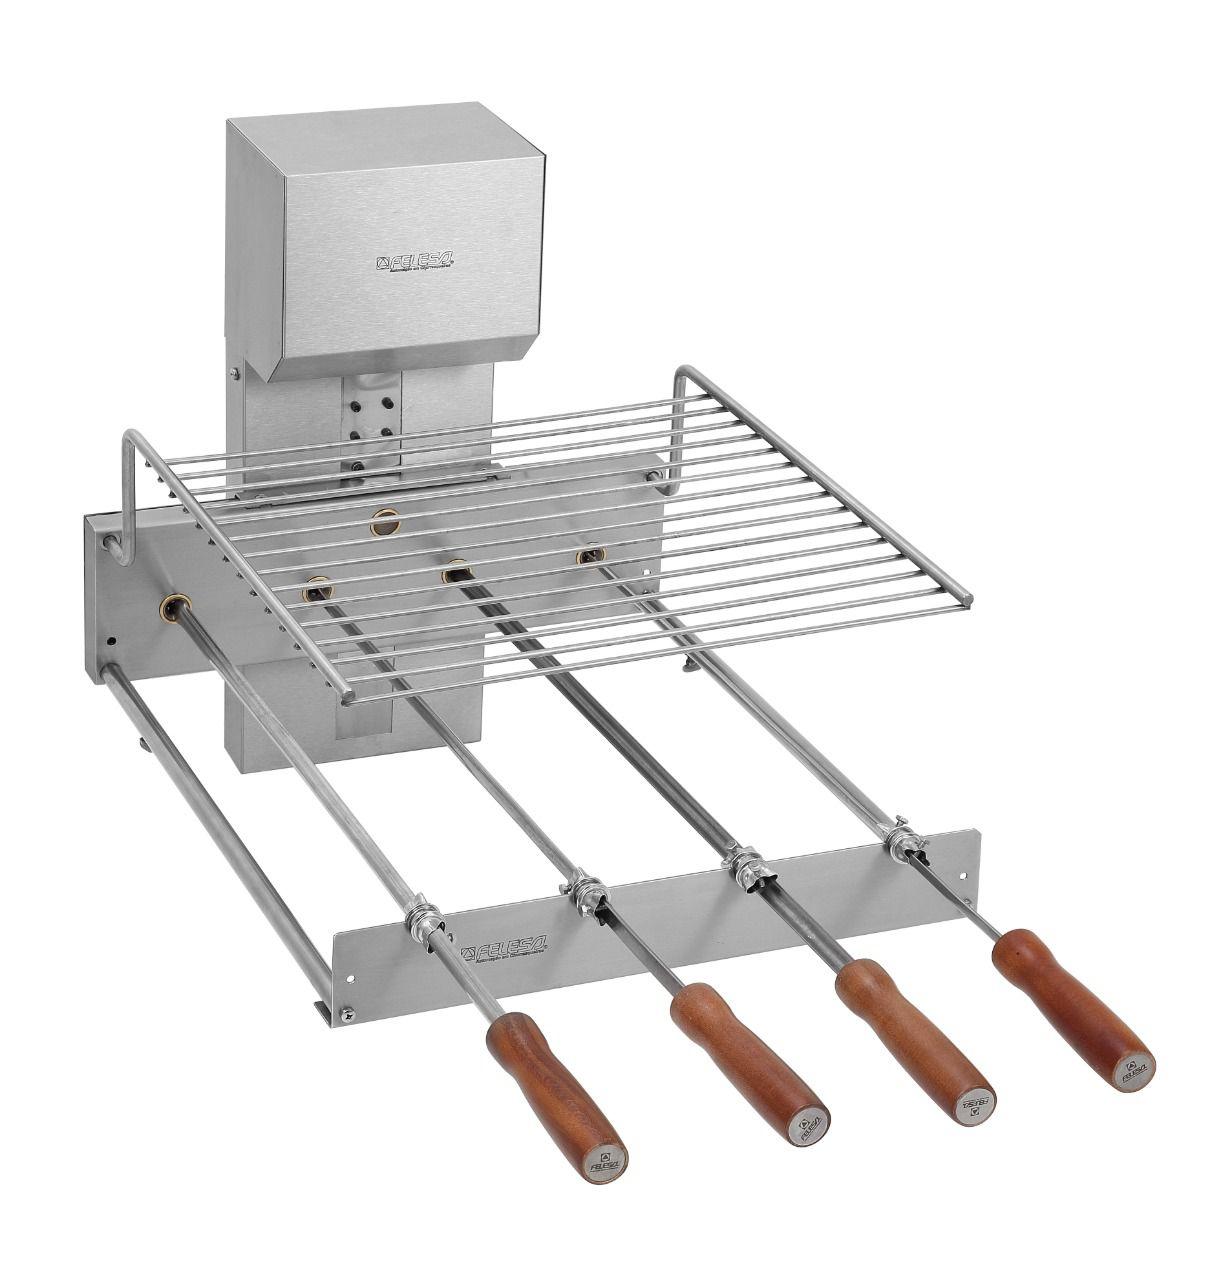 Grill inox elétrico versátil 4 espetos 50cm - Felesa